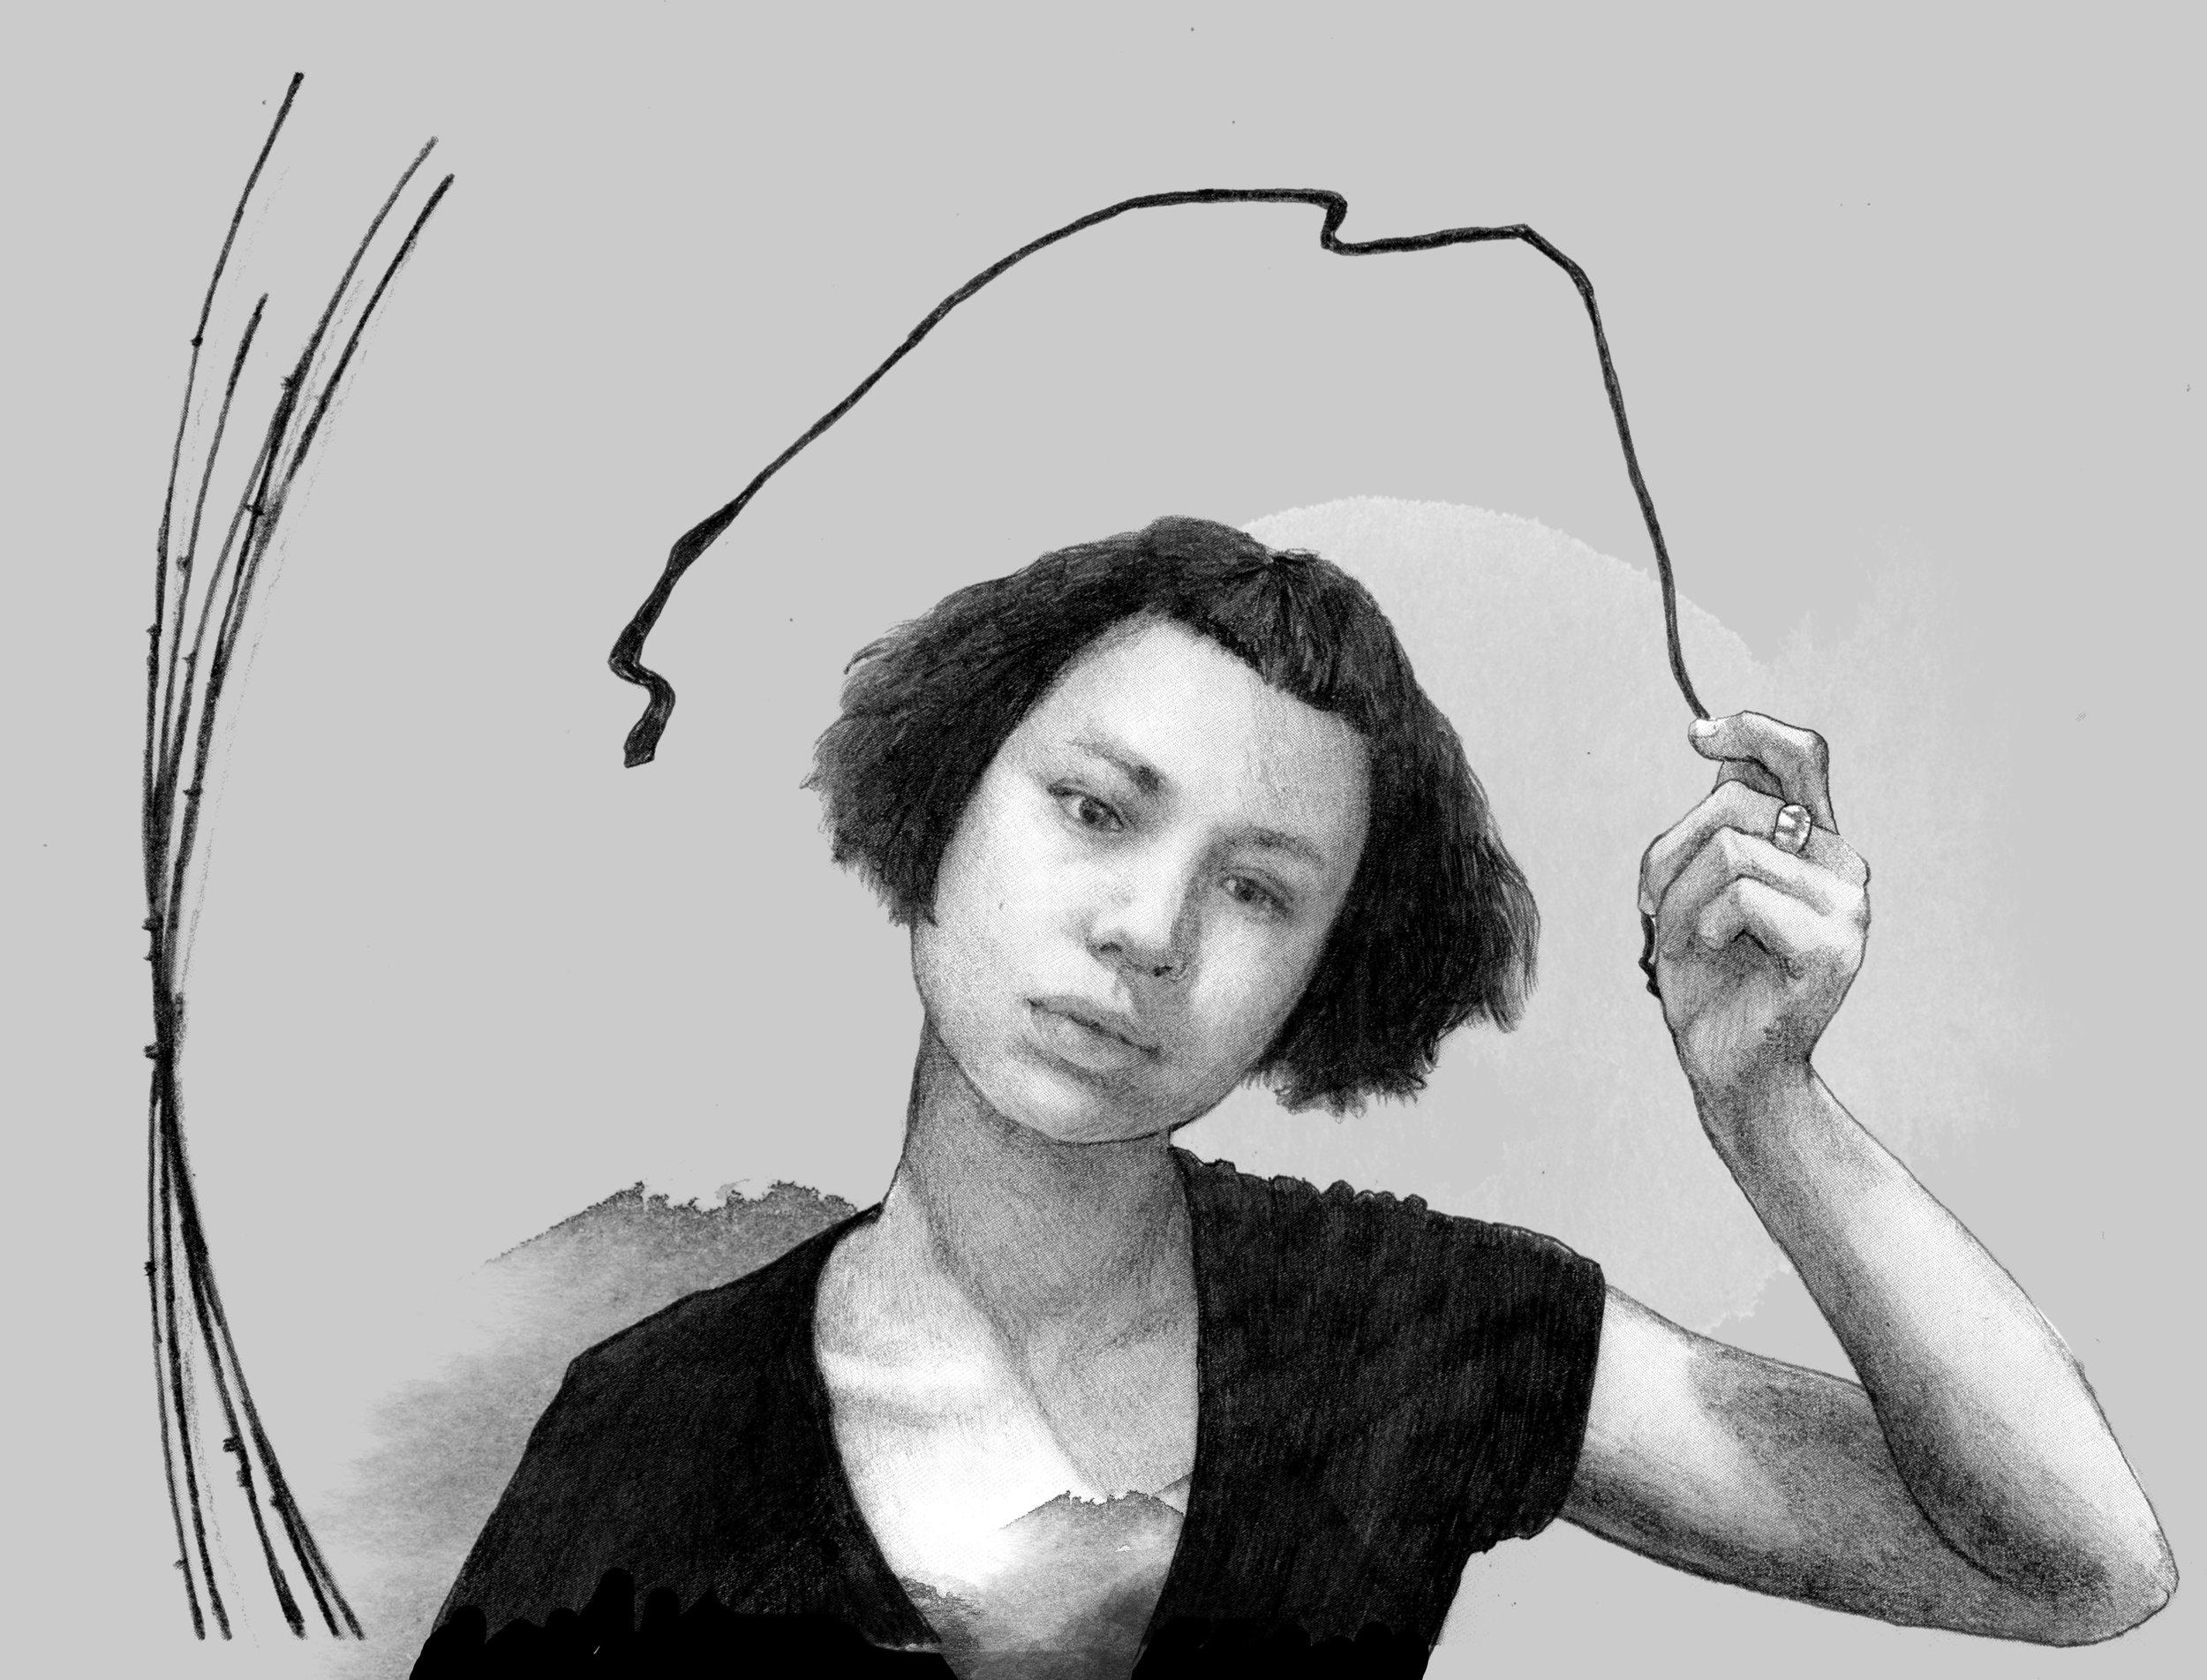 Penelope Anstruther   By  SPECIWOMEN  Illustration  VISNJA MIHATOV